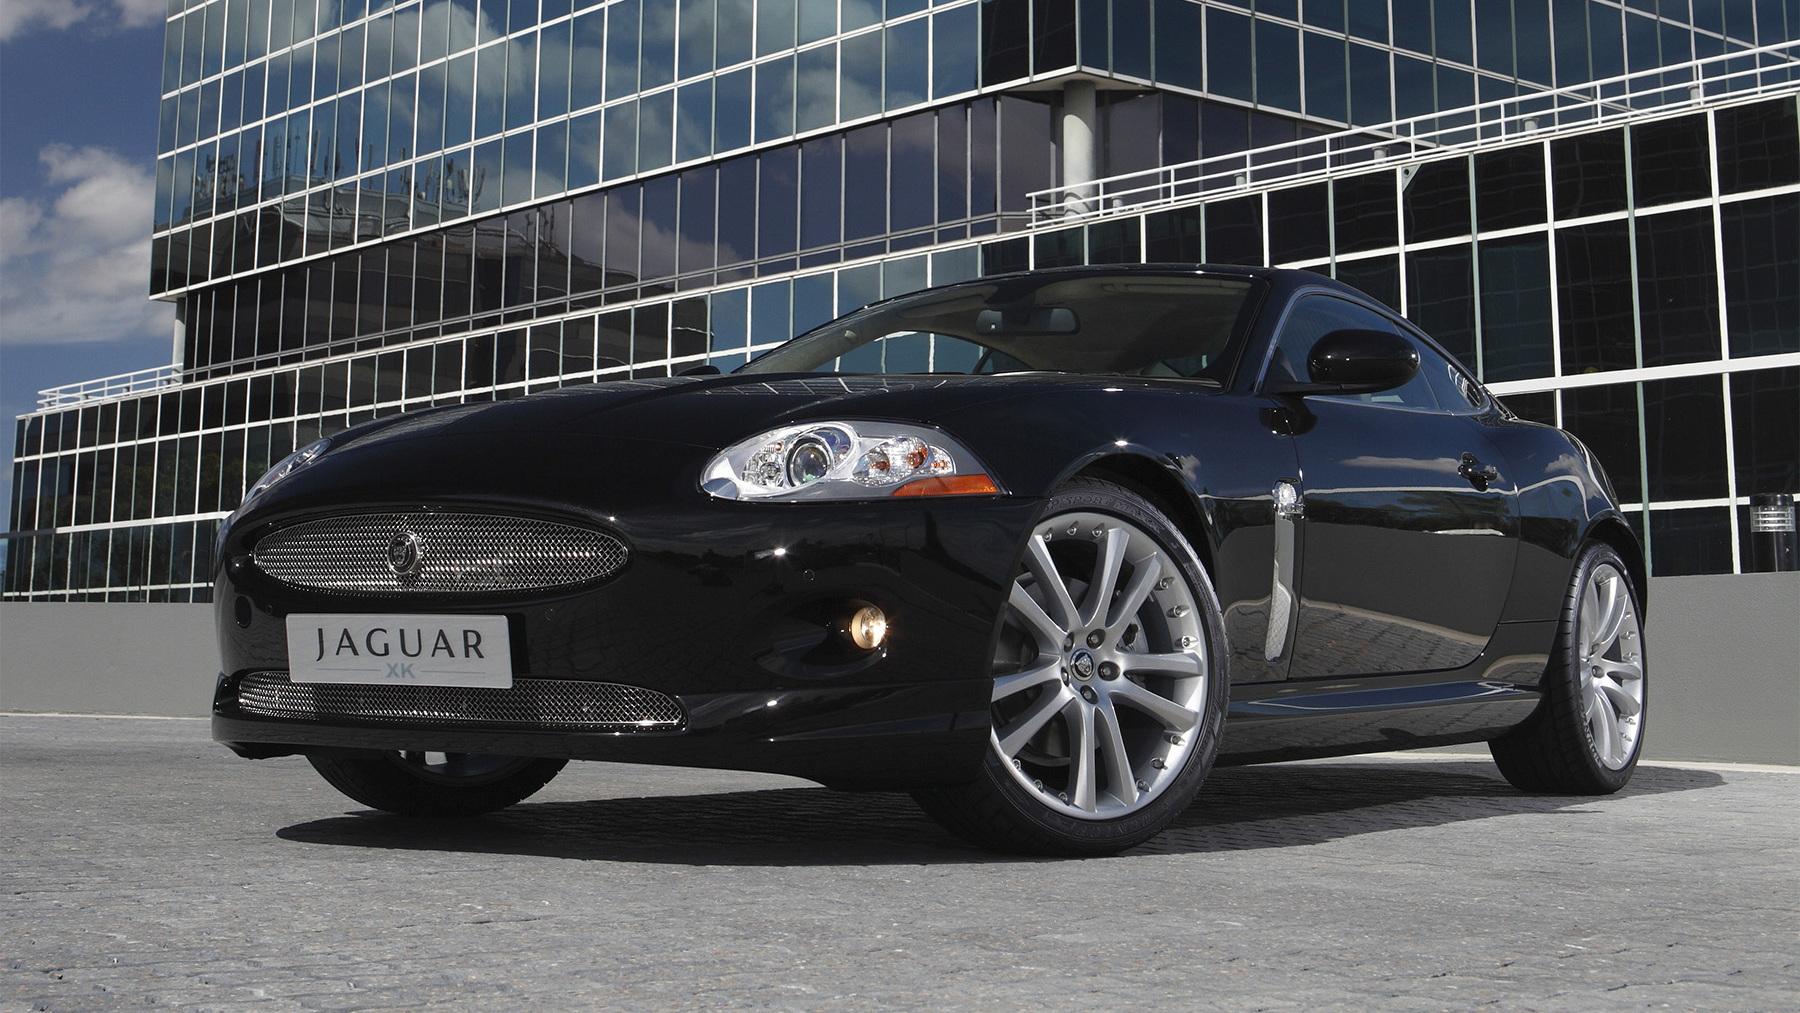 2009 jaguar xk s 003